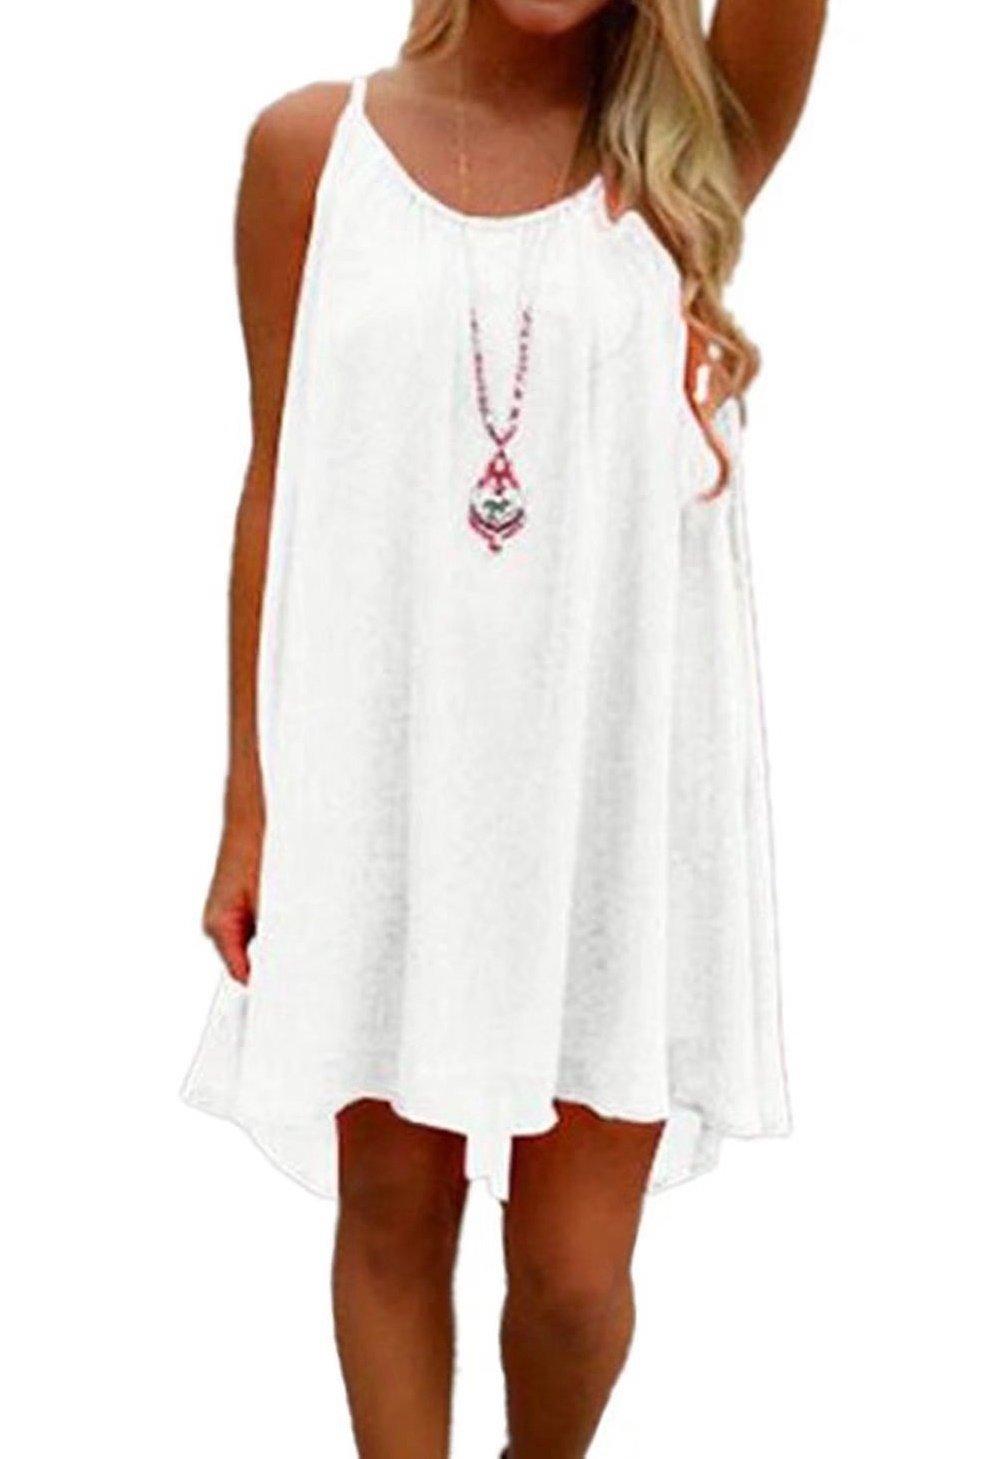 LeaLac Women's Summer Cotton Bathing Suit Cover up Beach Bikini Swimsuit Swimwear Crochet Dress Gift for Women Q24843 White